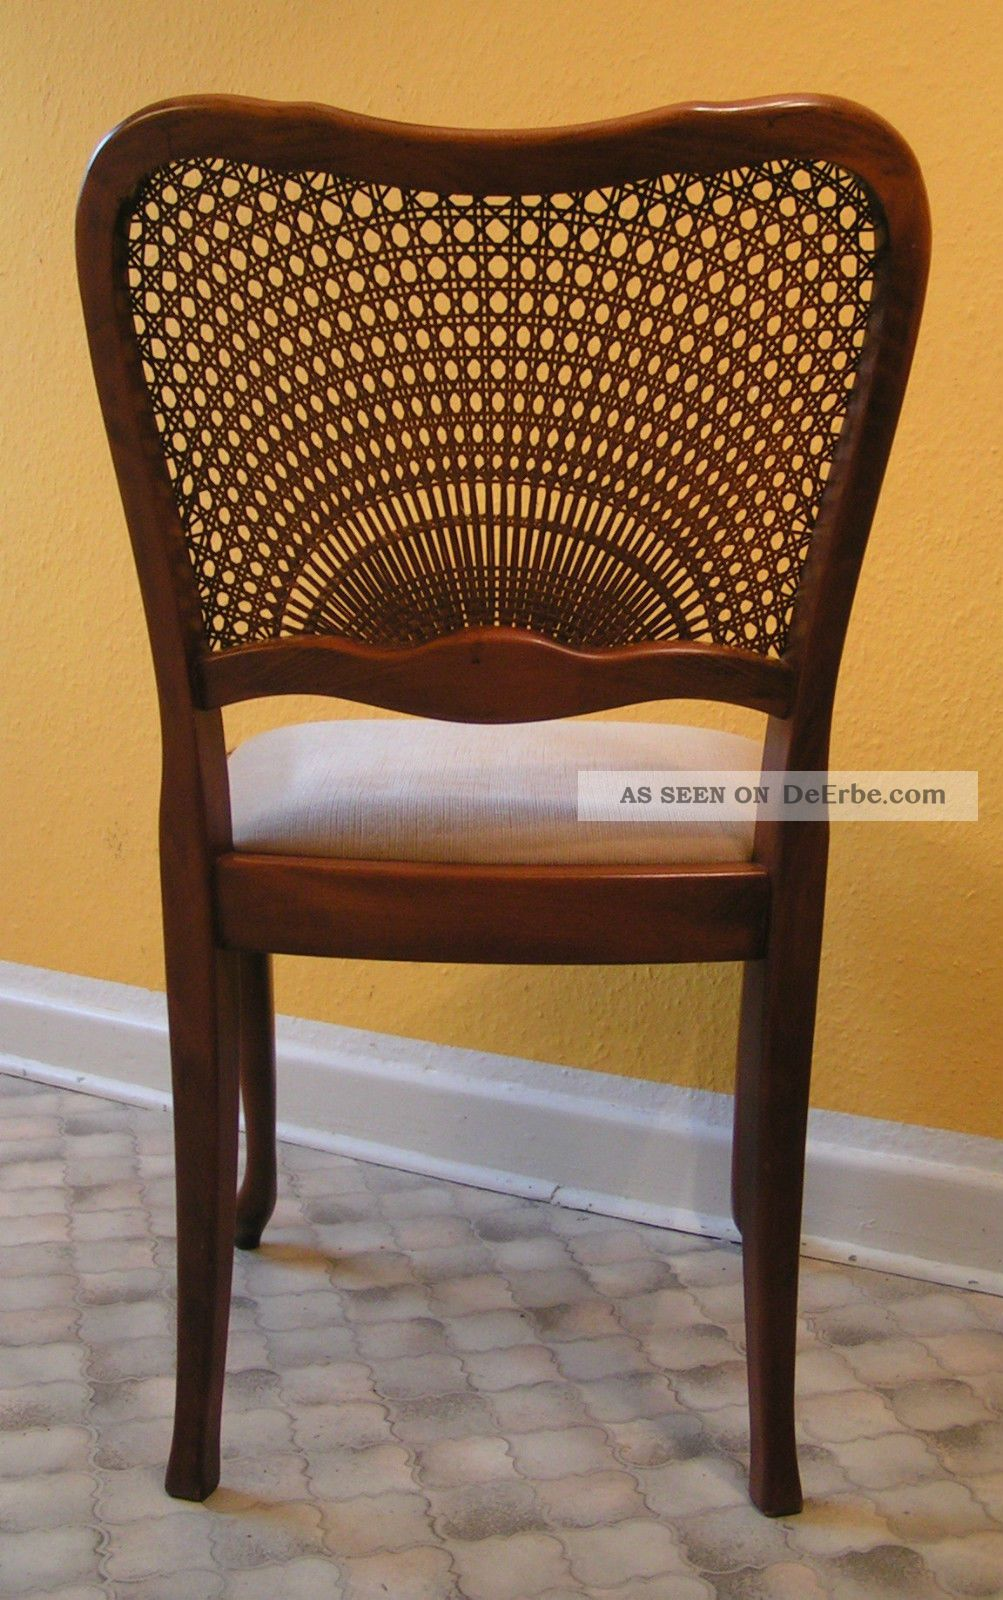 Antik stuhl chippendale wiener geflecht korbgeflecht for Stuhl design epochen